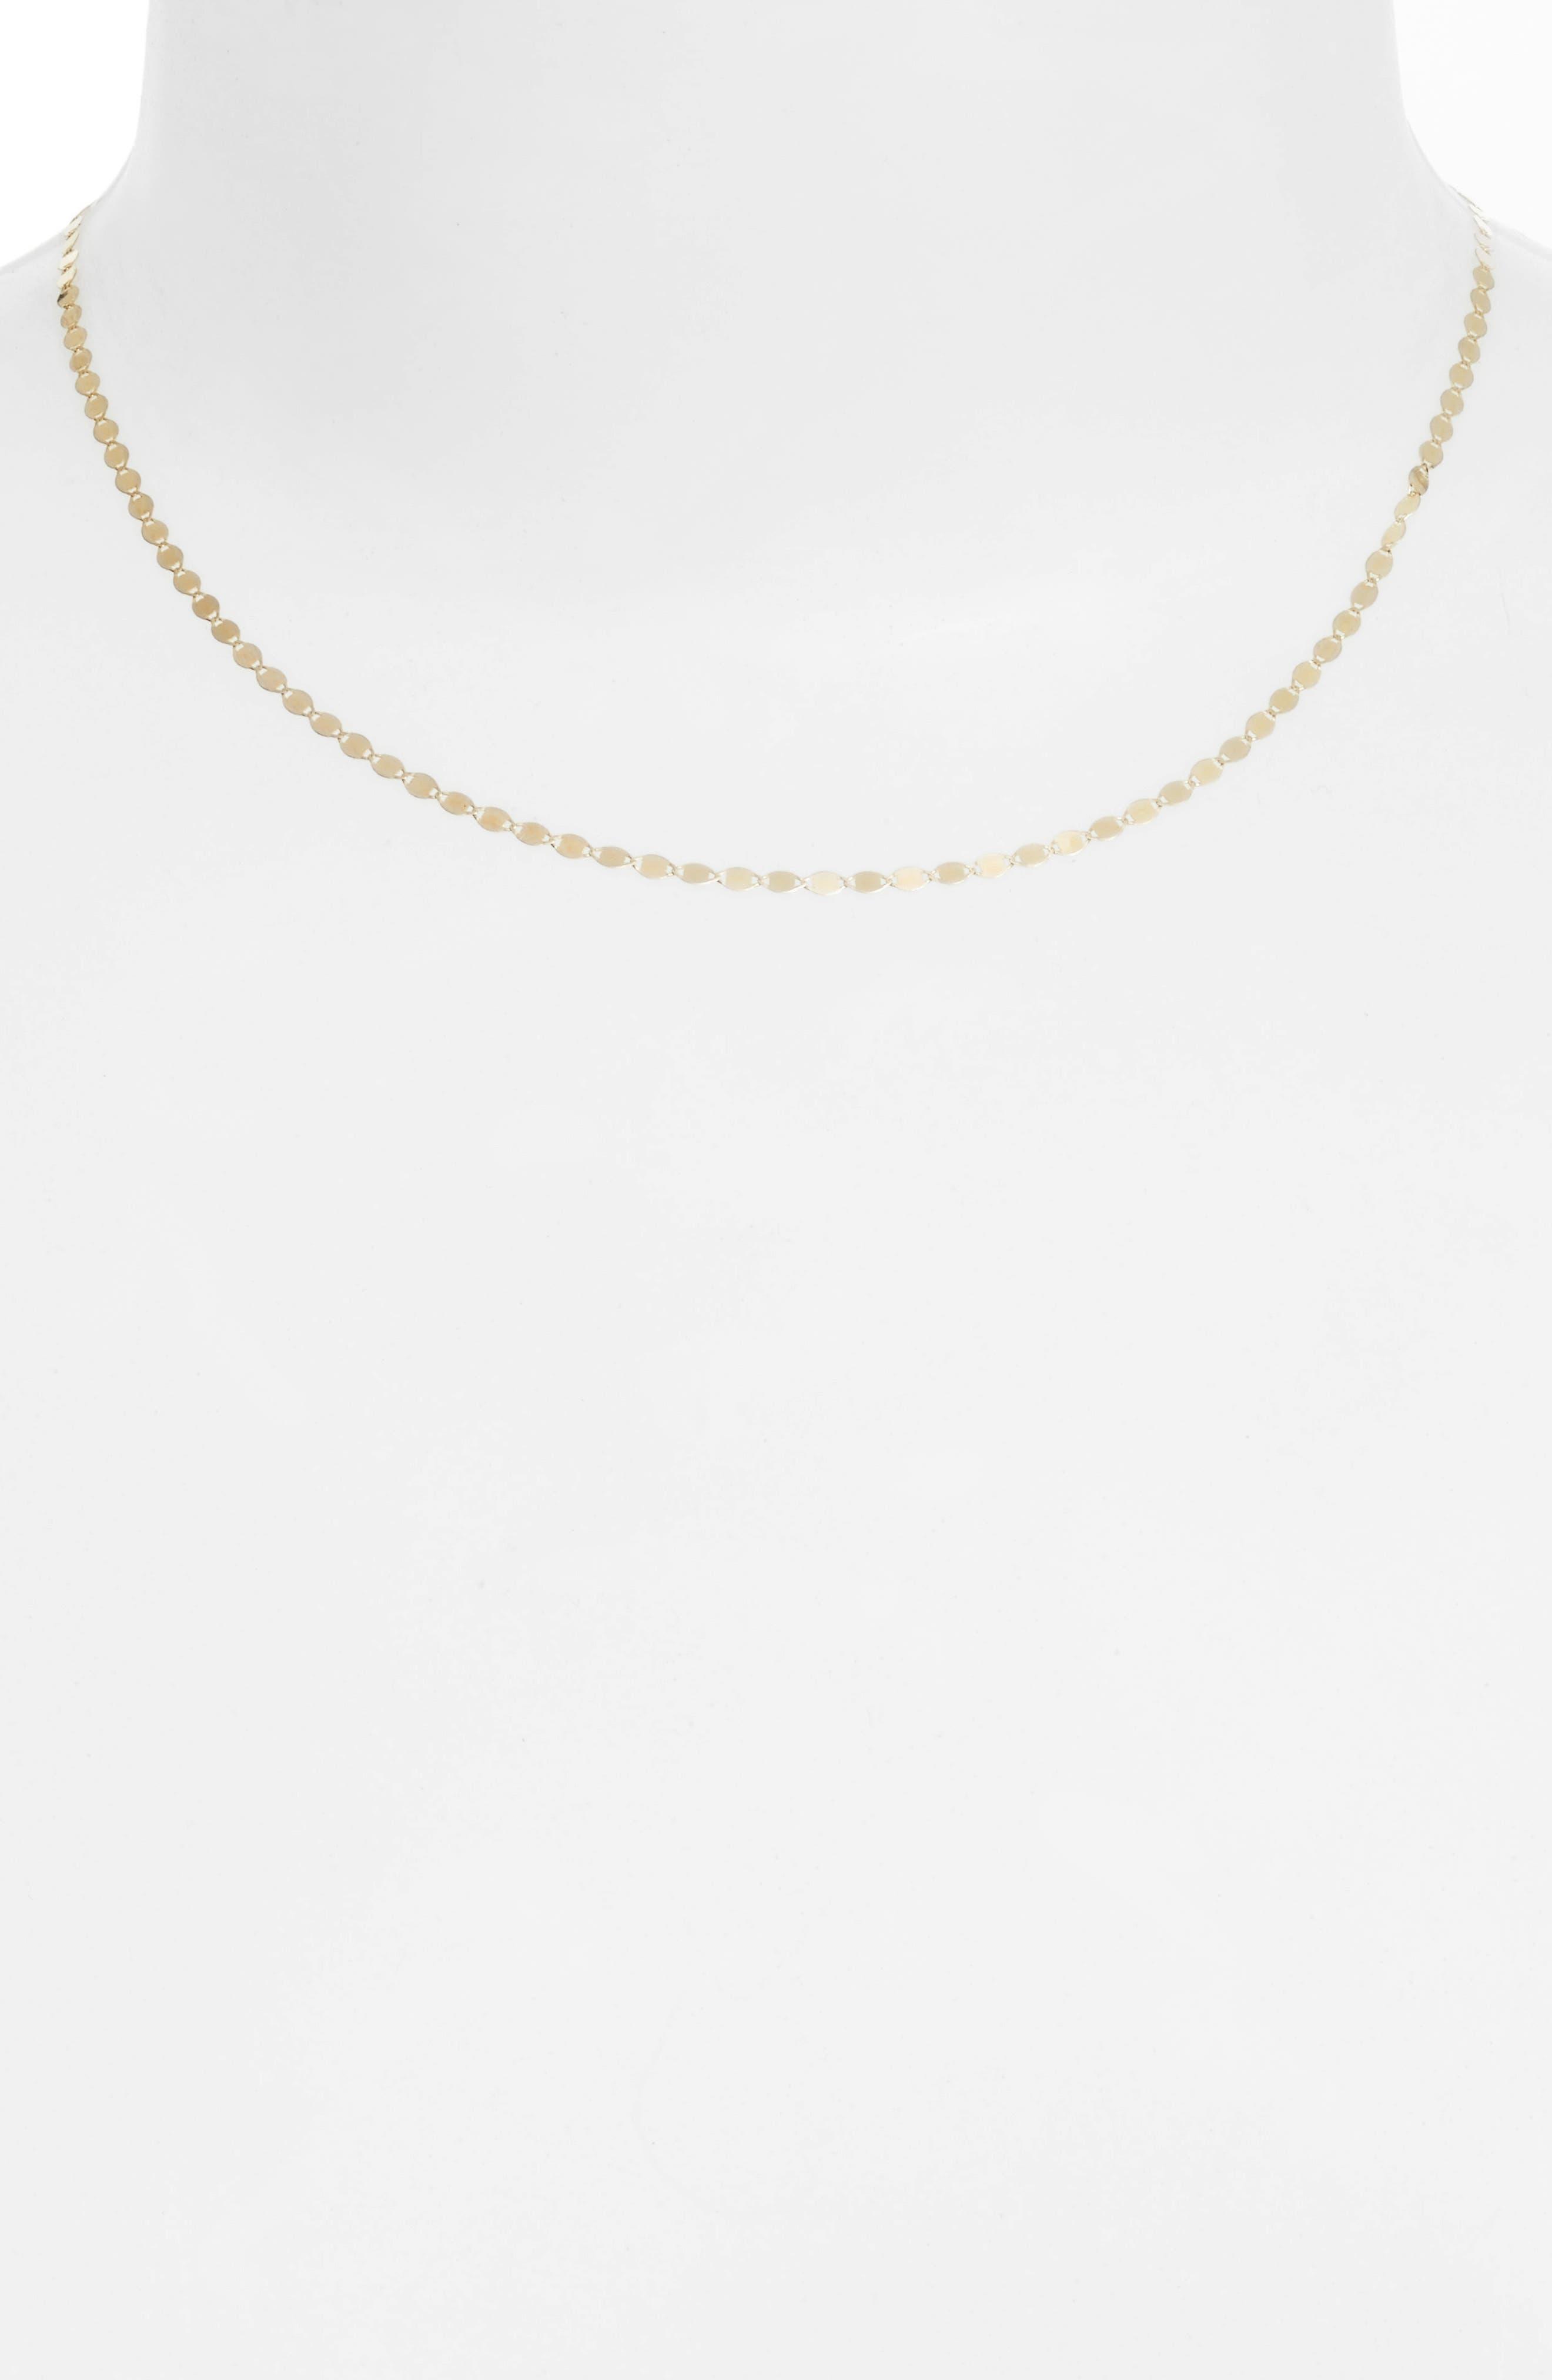 LANA JEWELRY Petite Nude Chain Choker, Main, color, YELLOW GOLD